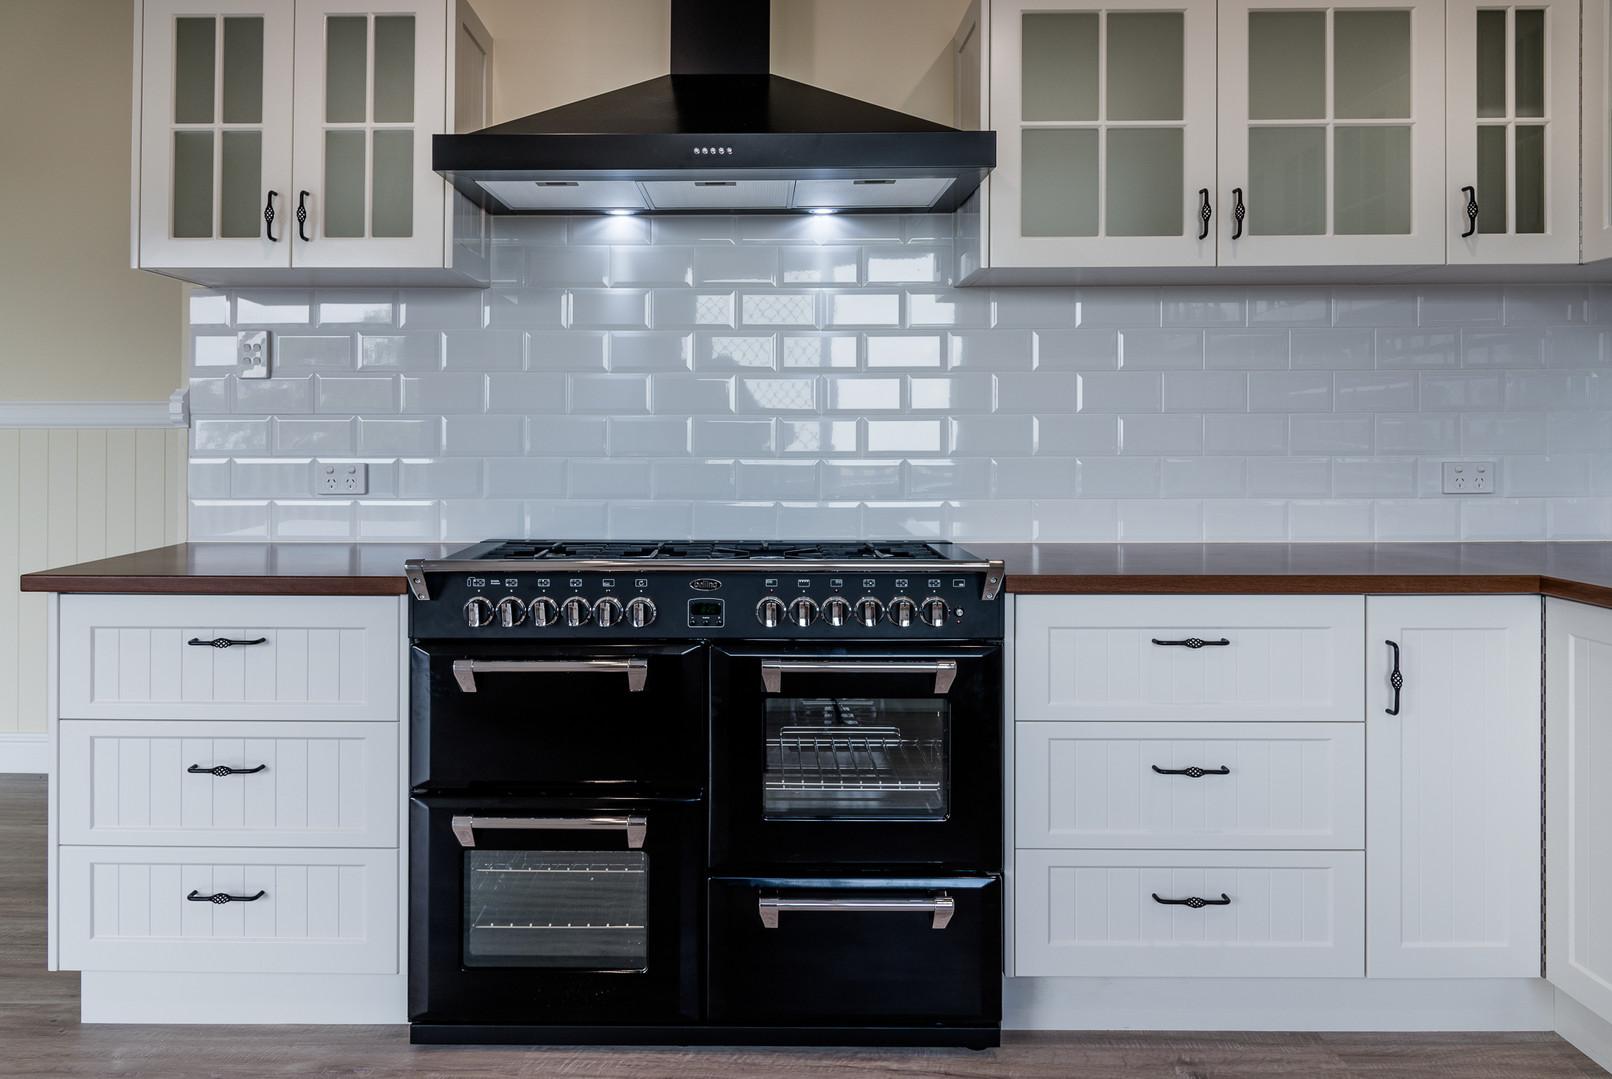 Kitchen_View_5_Copyright_Jordan_Clune_Ph